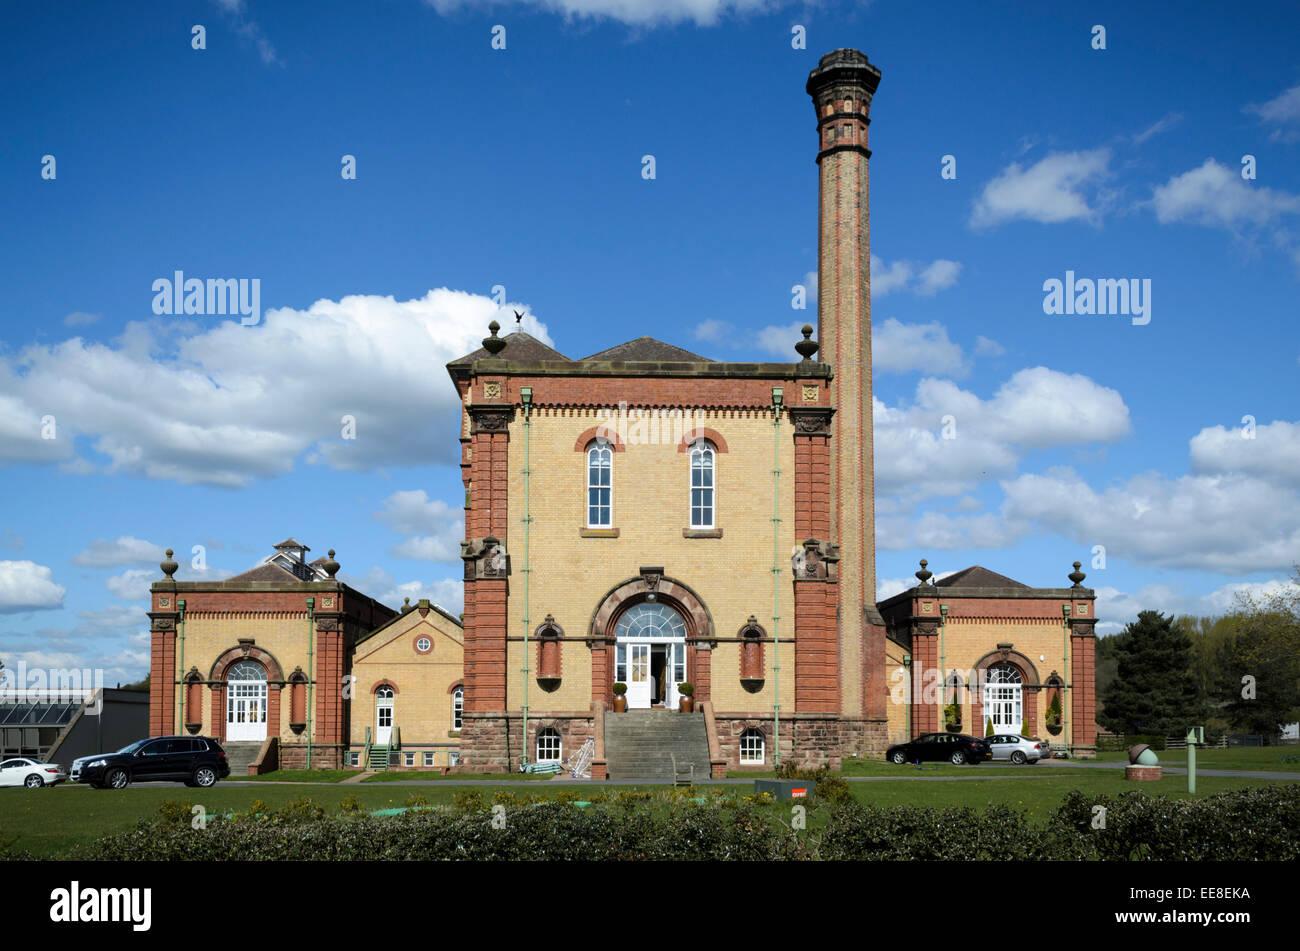 Classic Victorian Pumping Station, Hatton, Staffordshire, UK - Stock Image